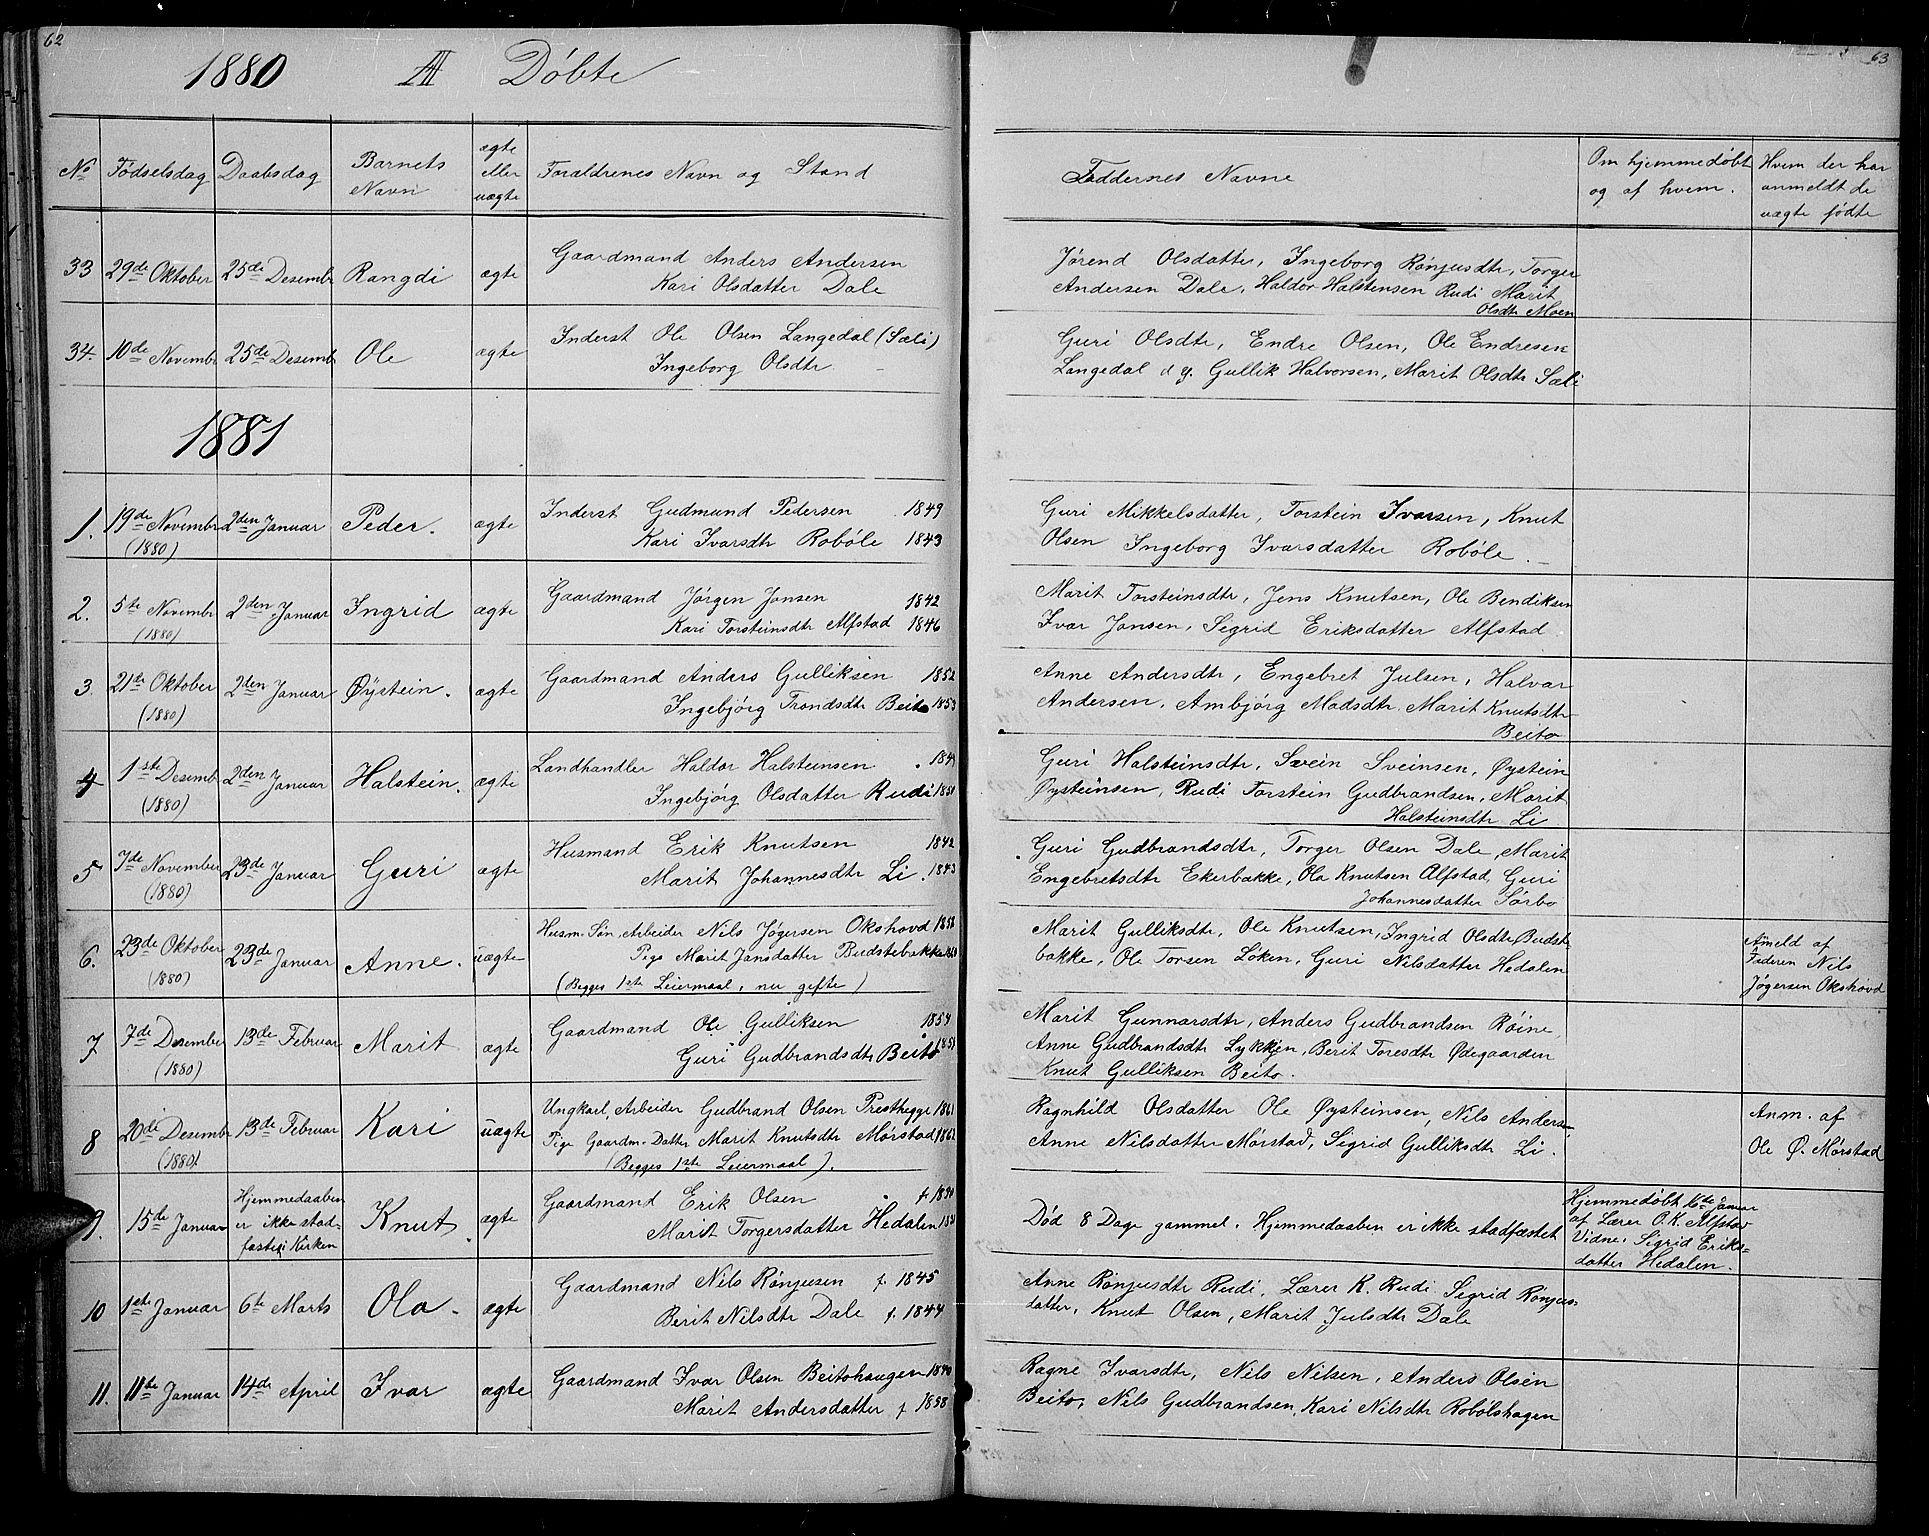 SAH, Øystre Slidre prestekontor, Klokkerbok nr. 1, 1866-1886, s. 62-63